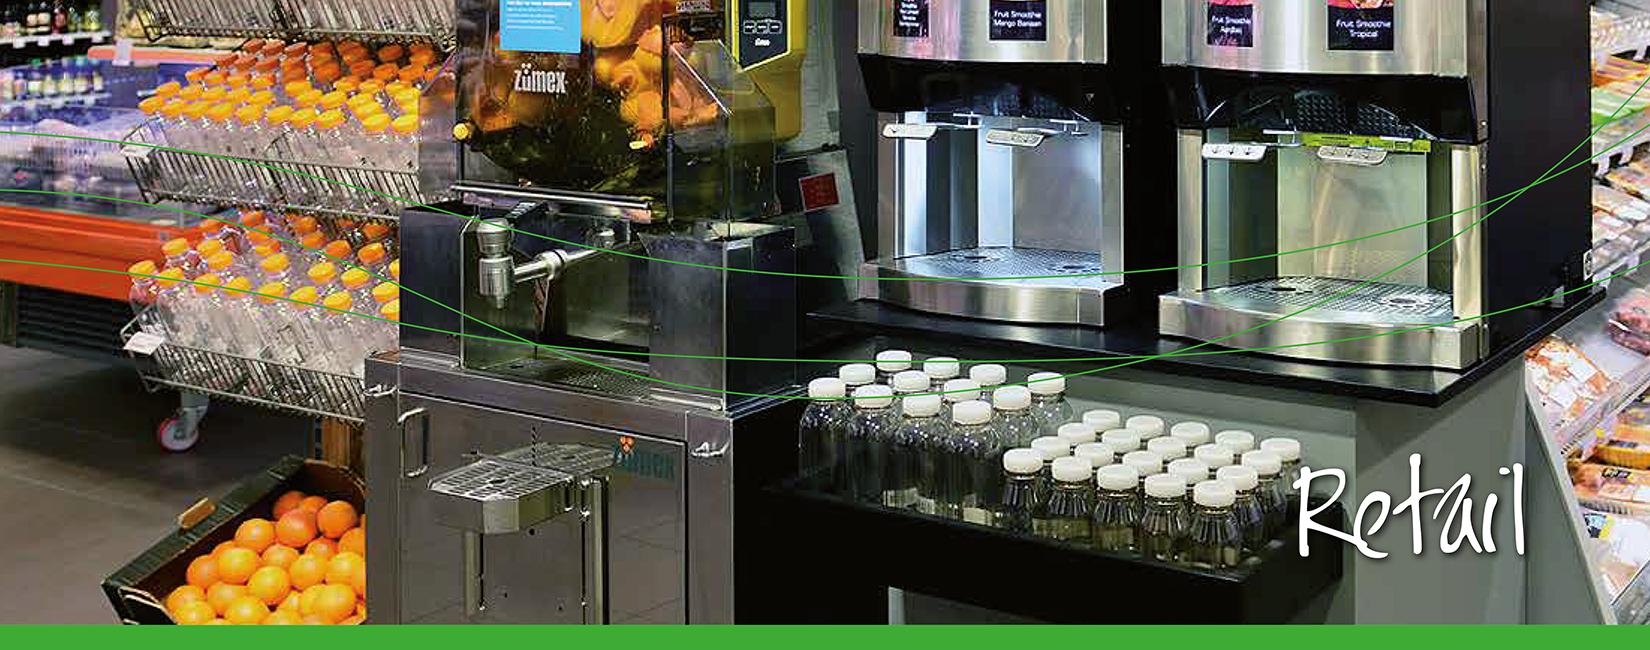 Oranka Juice Solutions - Retail